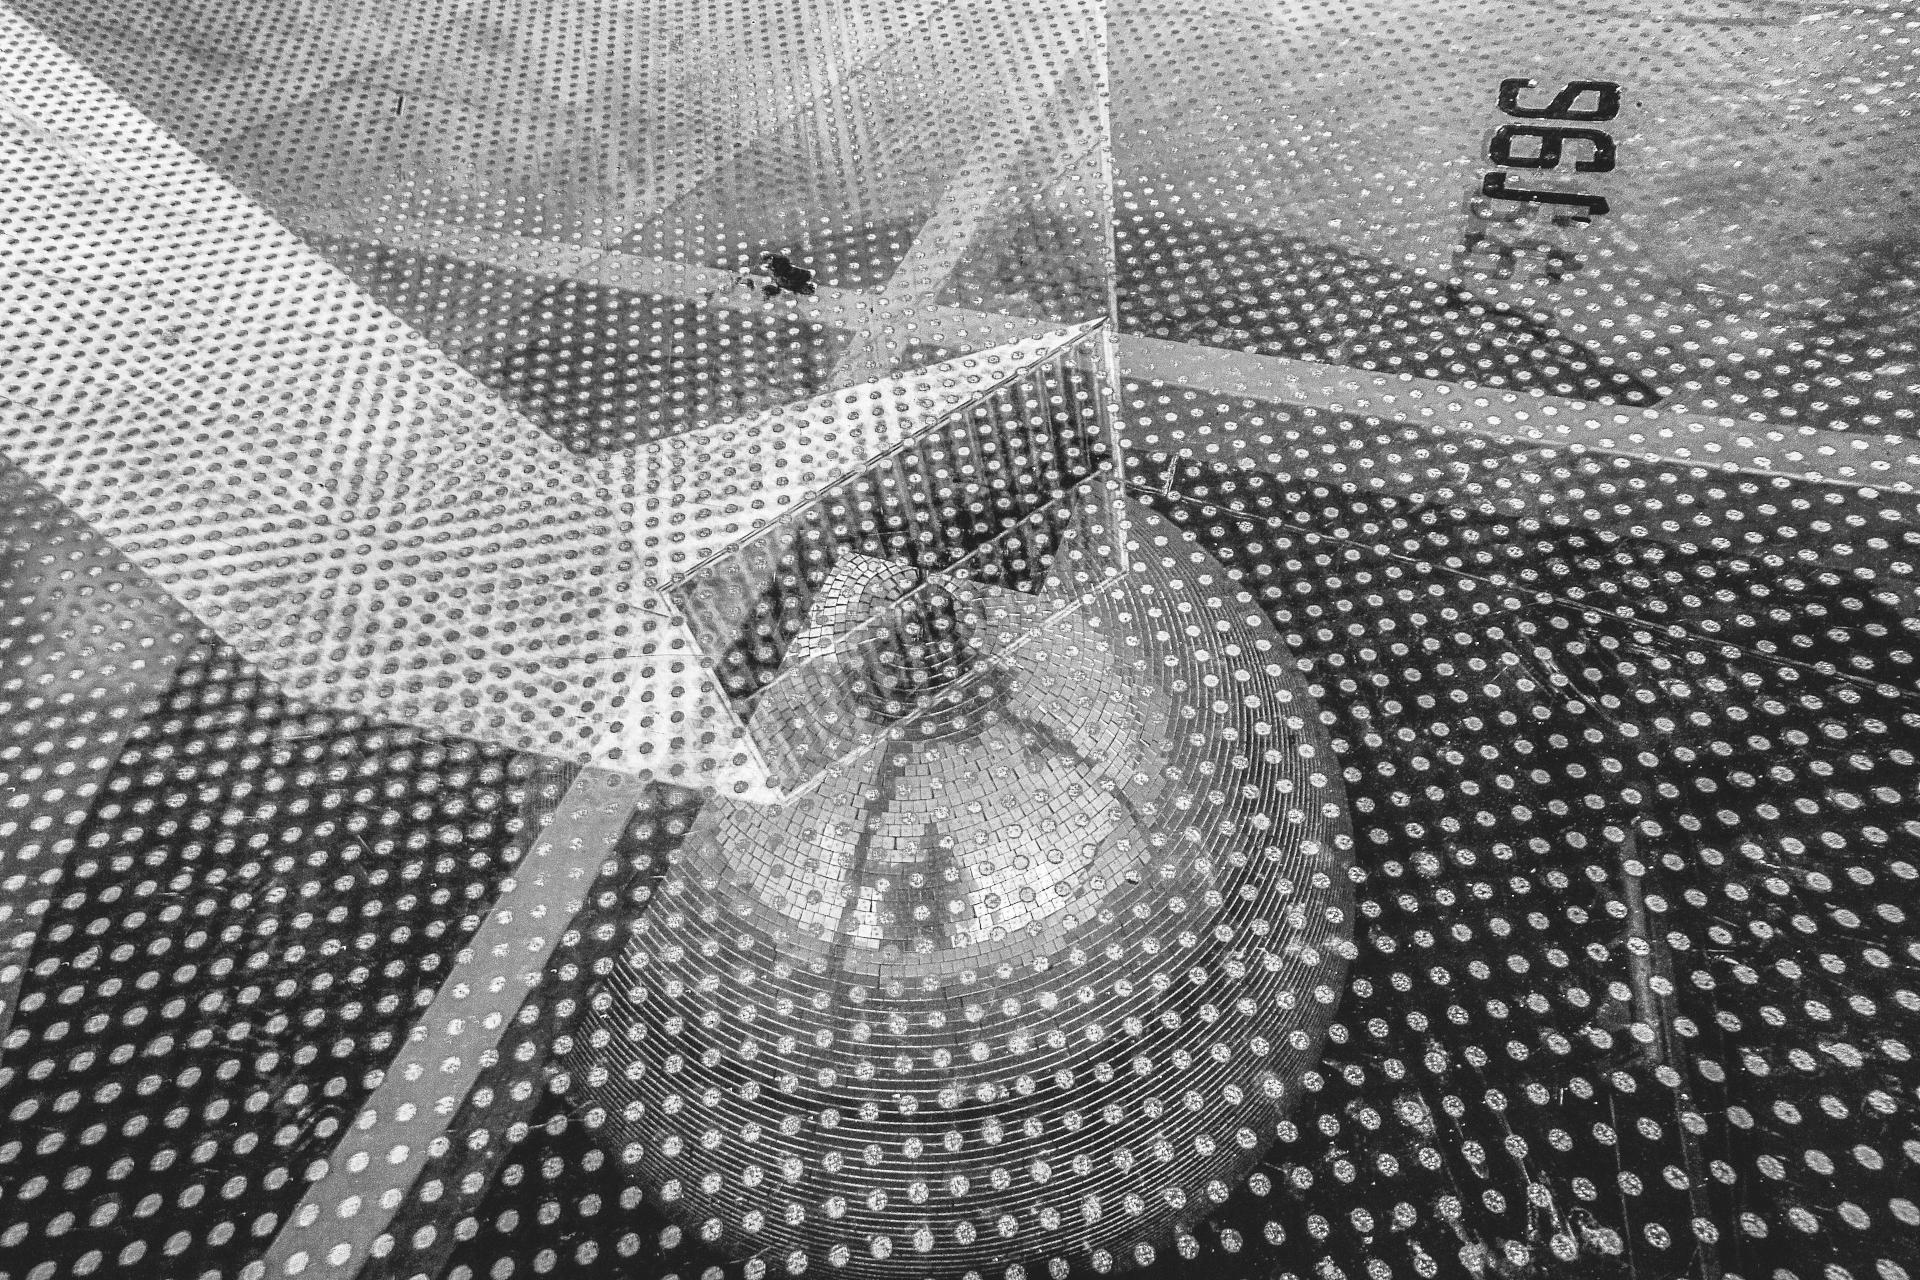 10-Aniversario-Casa-da-Musica-Porto-Reportagem-Fotografica-Photographic-Coverage-Fotografia-Photography-Arquitectura-Architecture-Rem-Koolhaas-bonjourmolotov-44BN2.jpg